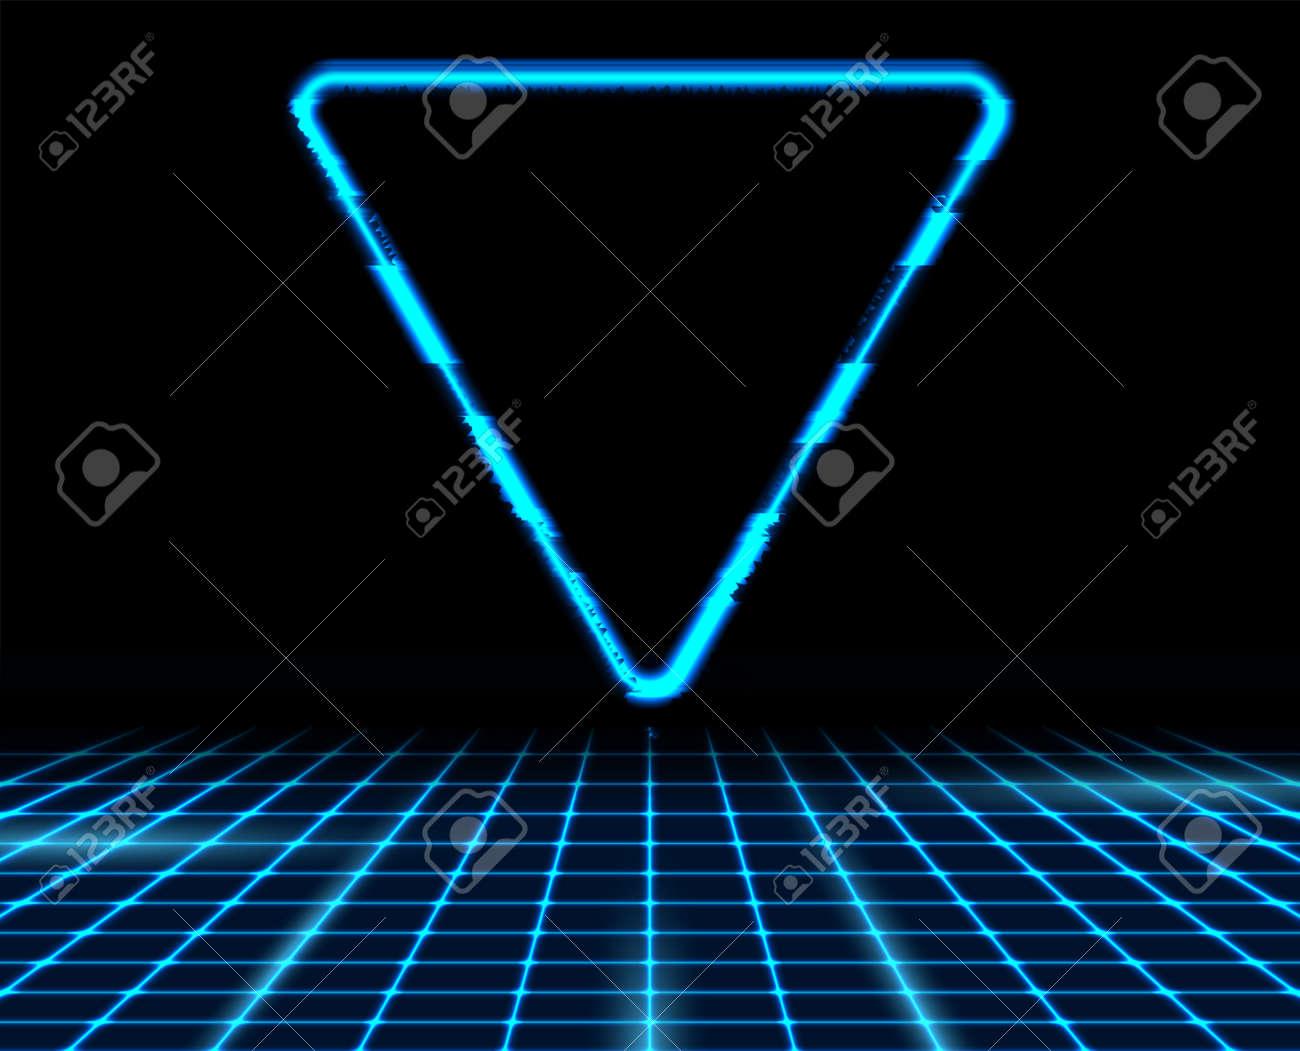 Retro futuristic 80s - 90s abstract hi-tech neon background with blue triangle. Vector poster design - 169078186